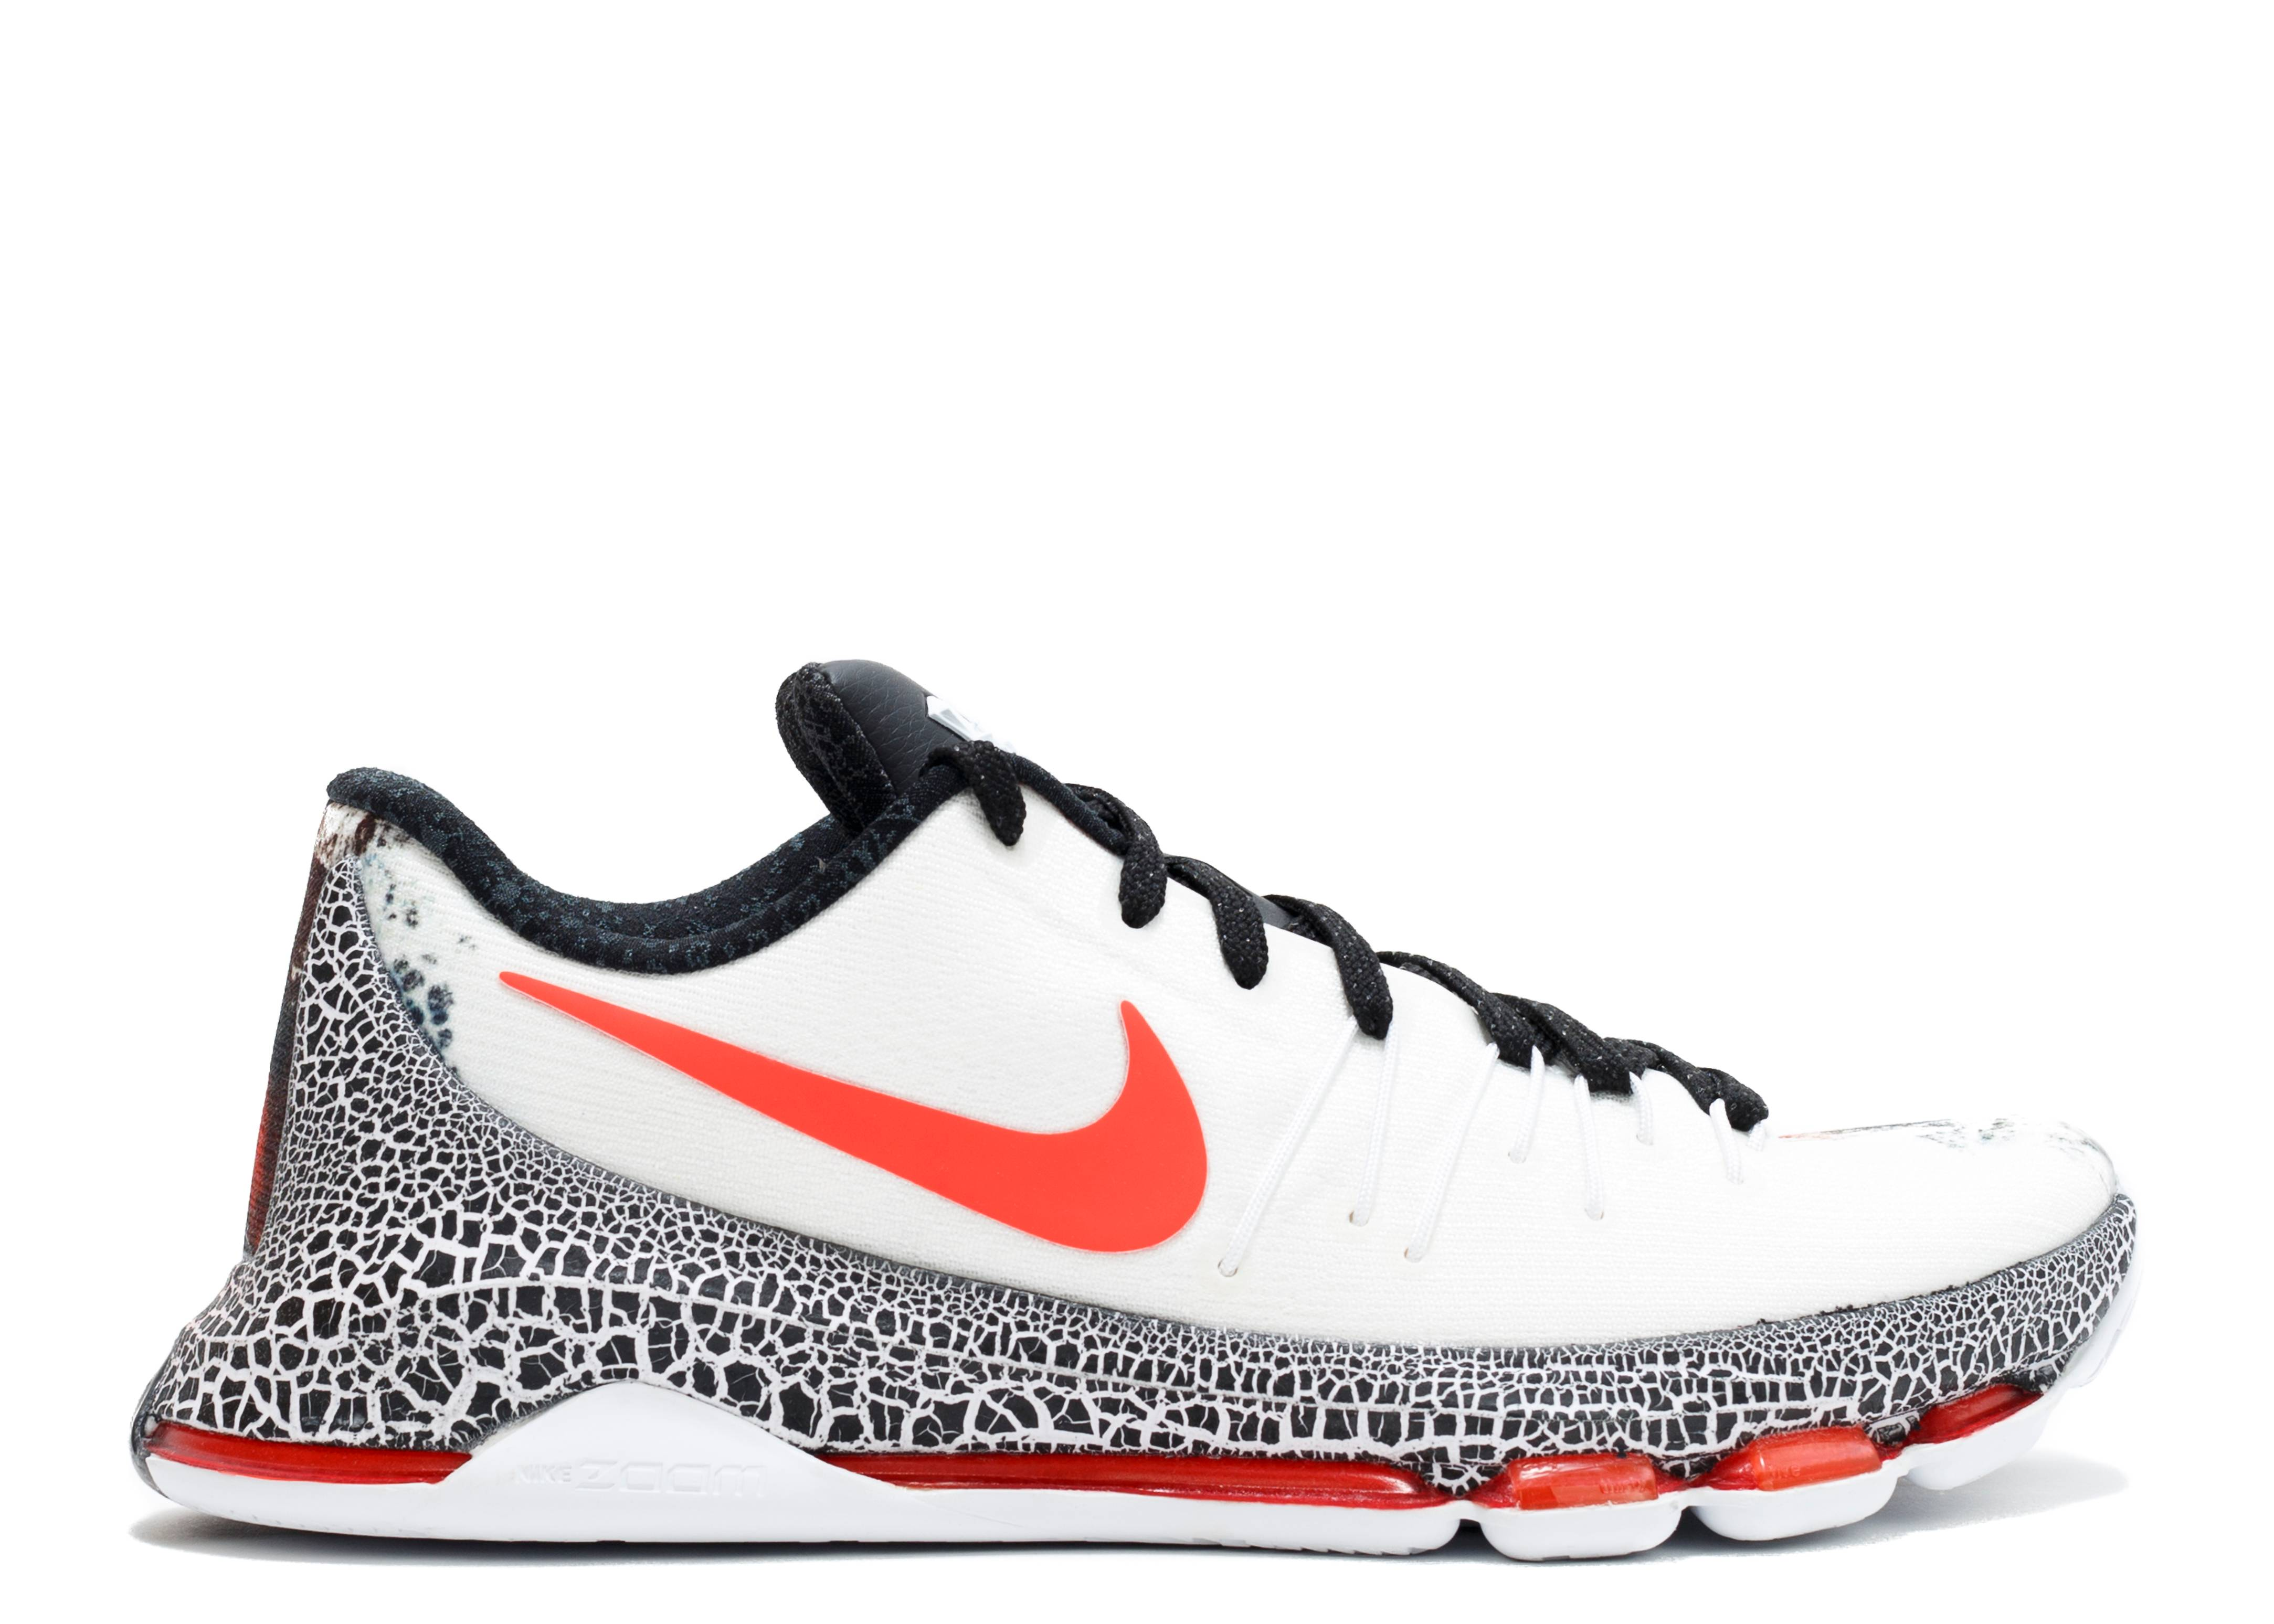 release date 47738 f6a8a Kd 8 Xmas - Nike - 822948 106 - white black-bright crimson   Flight Club